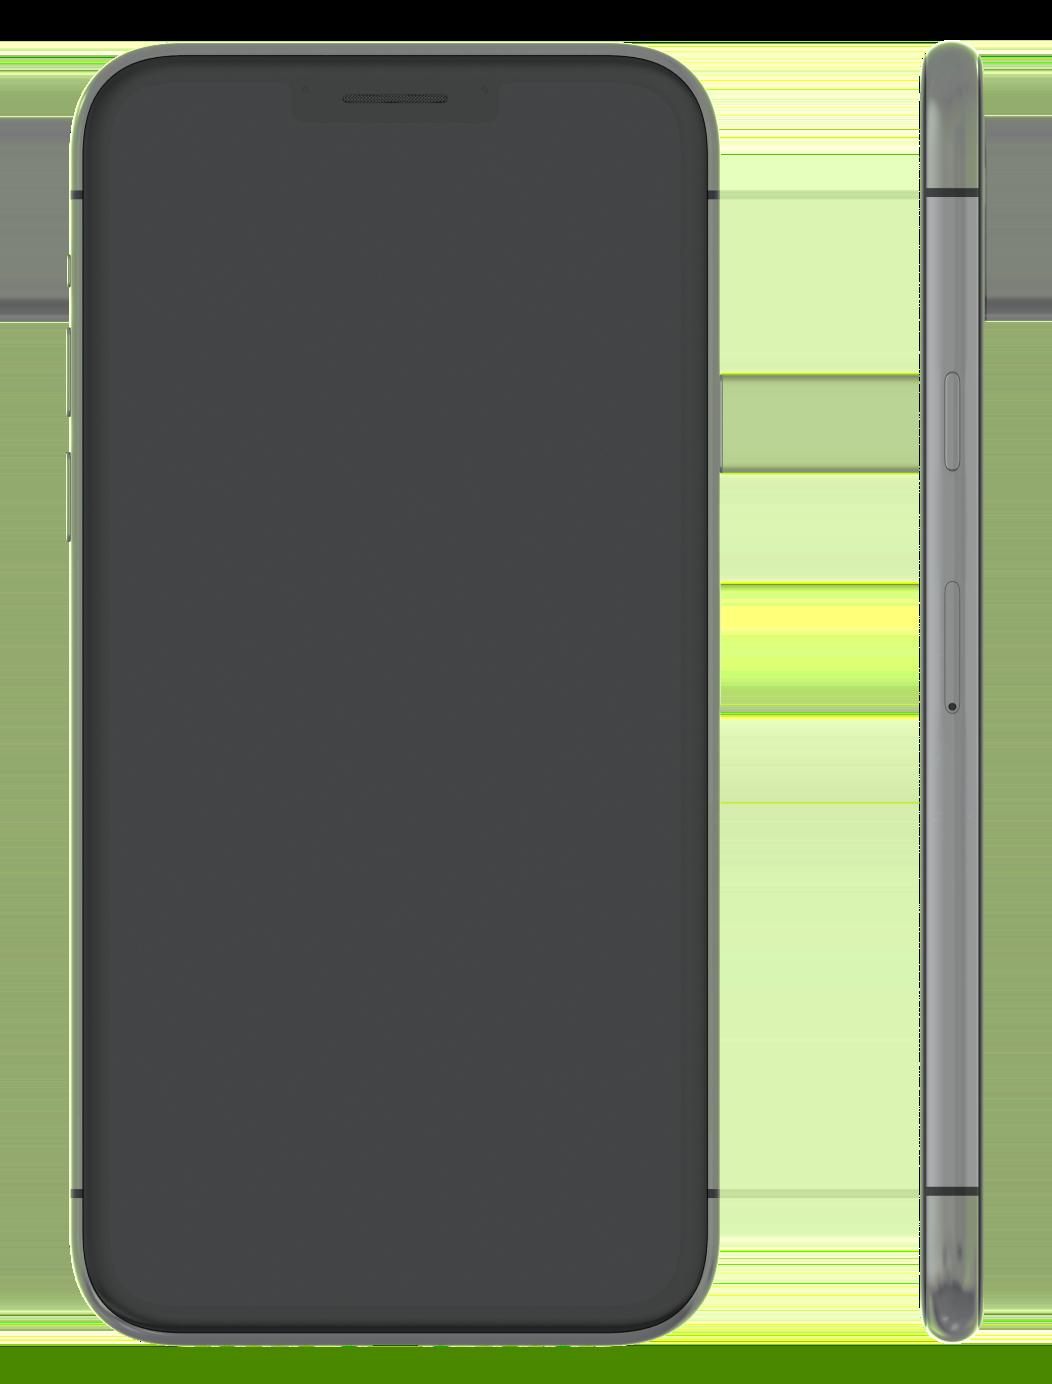 Mint condition image